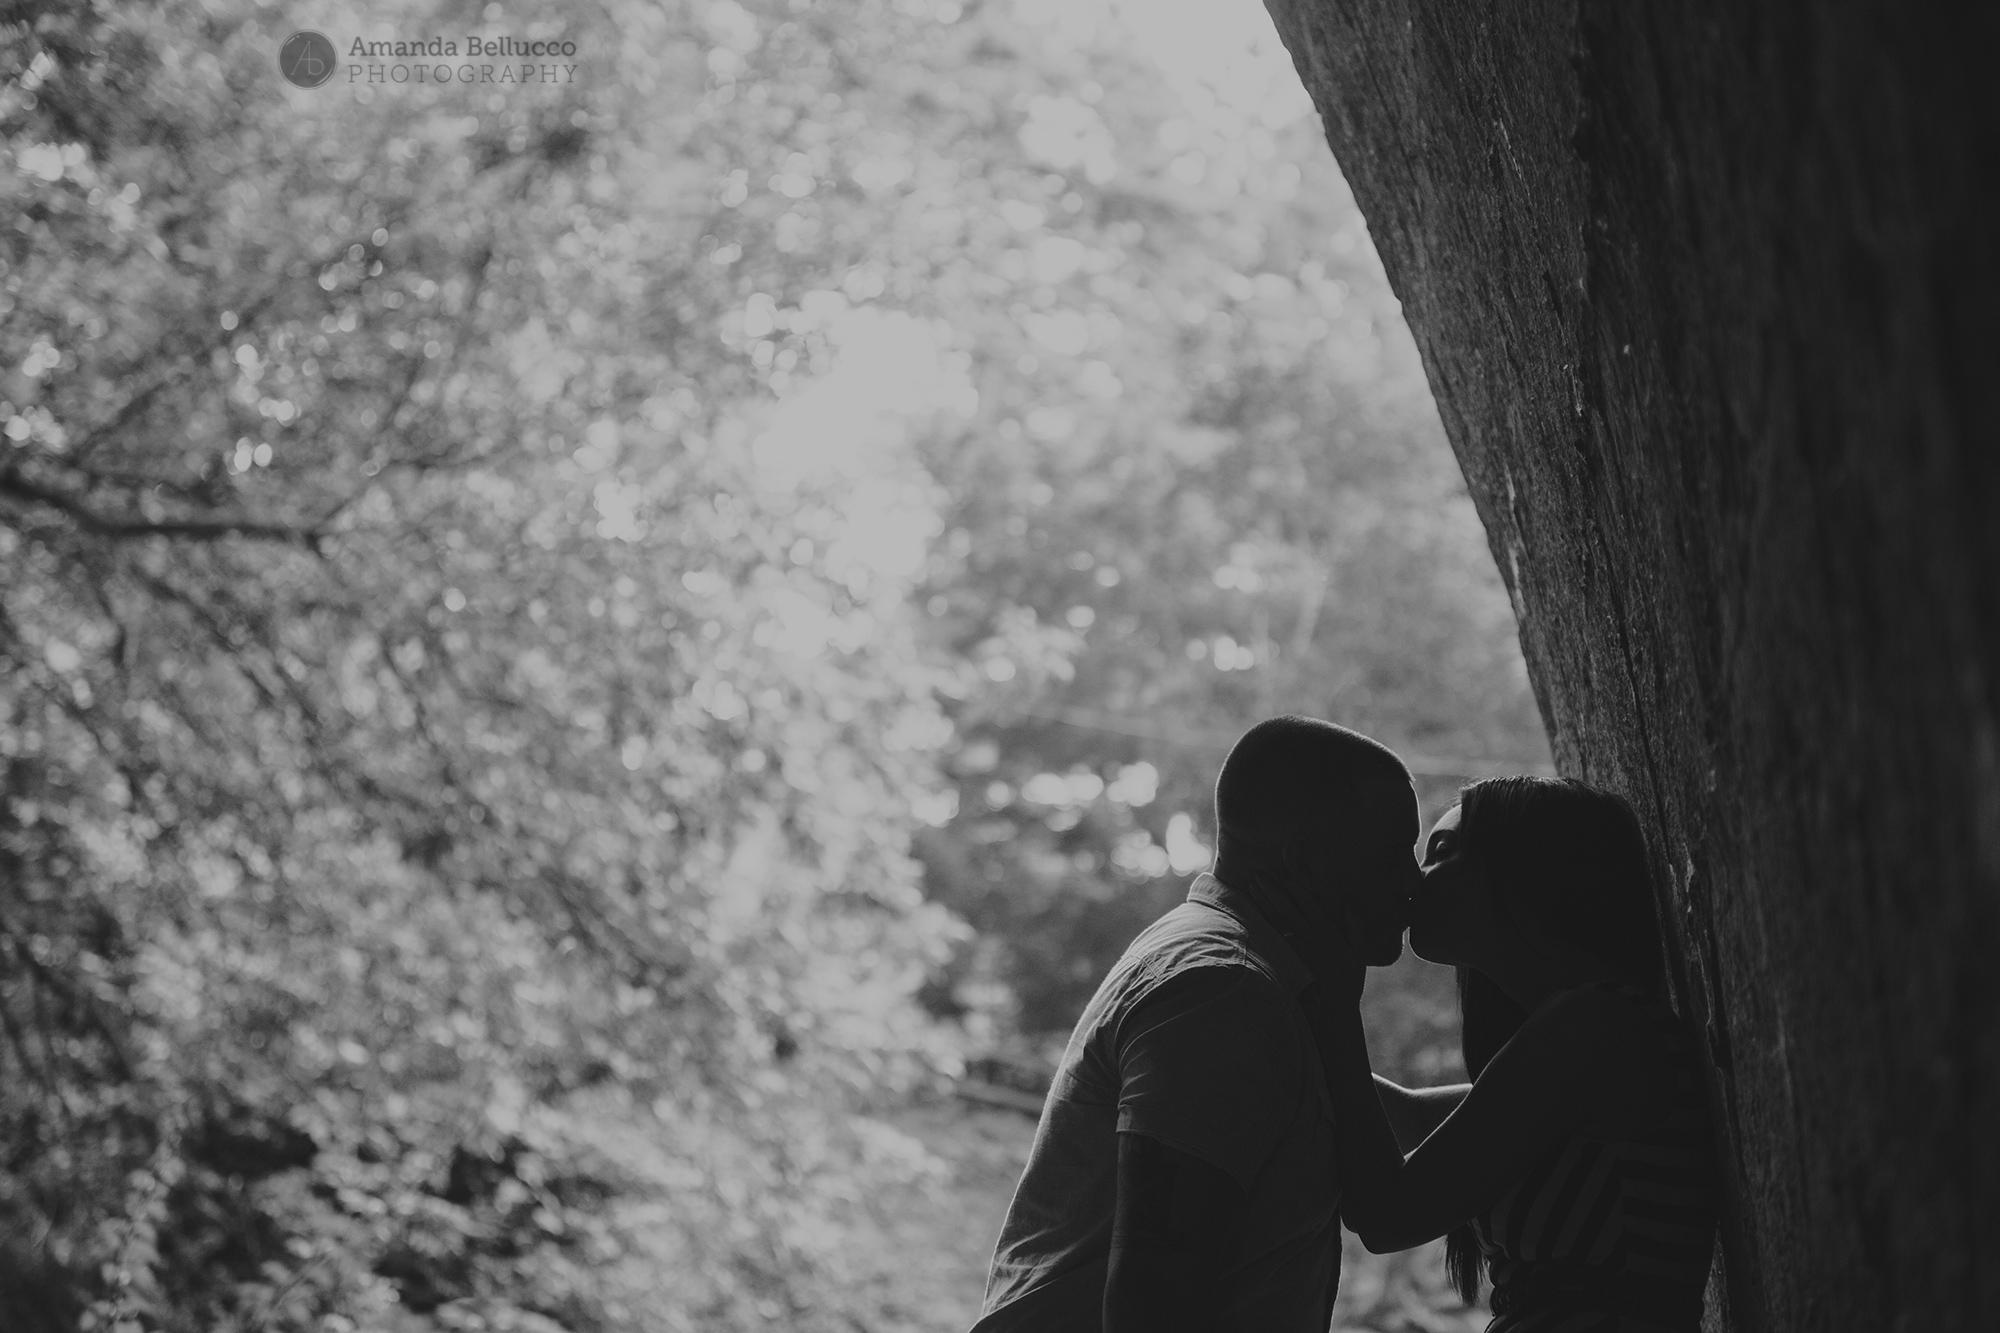 rochester_ny_engagement_wedding_photographer_17.jpg